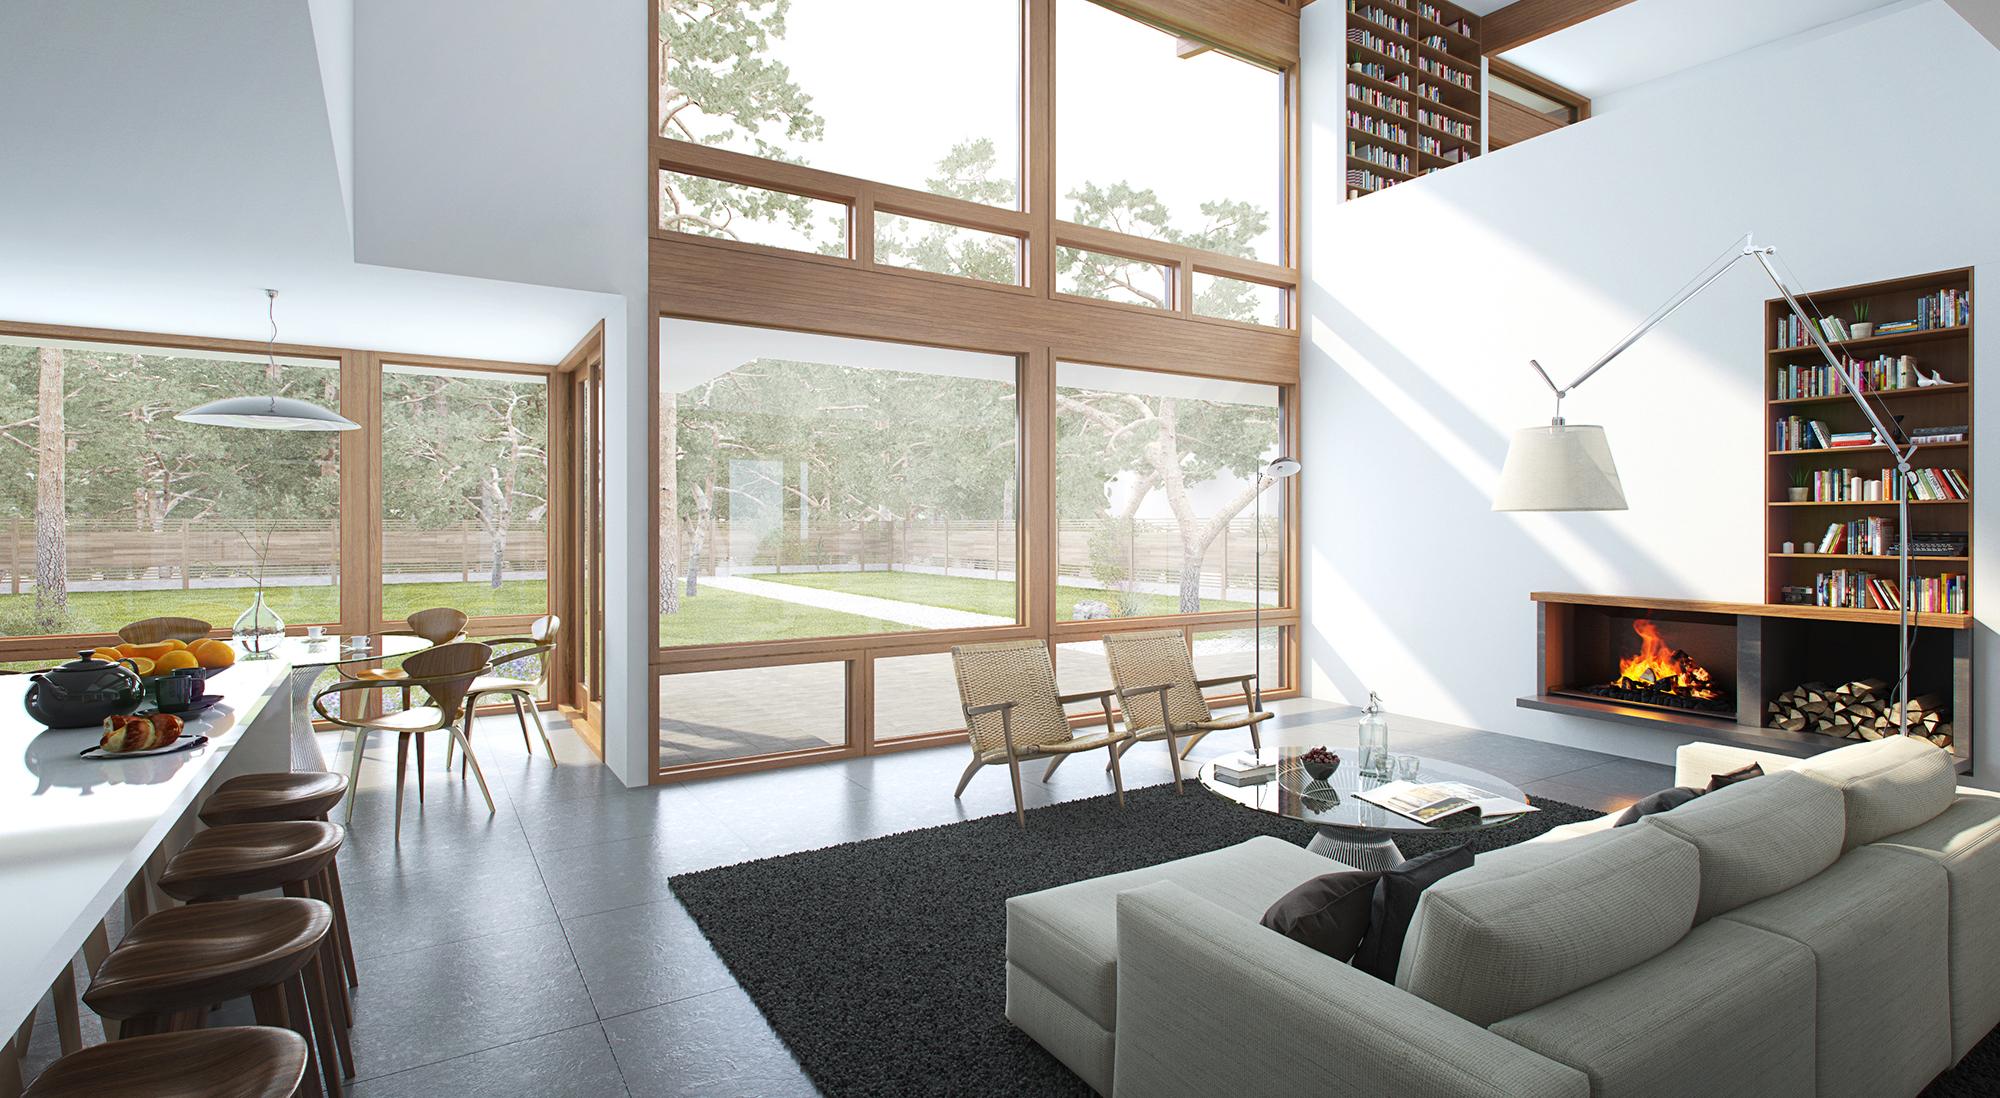 turkel_design_modern_prefab_home_axiom_series_rendering_axiom2390_interior.jpg